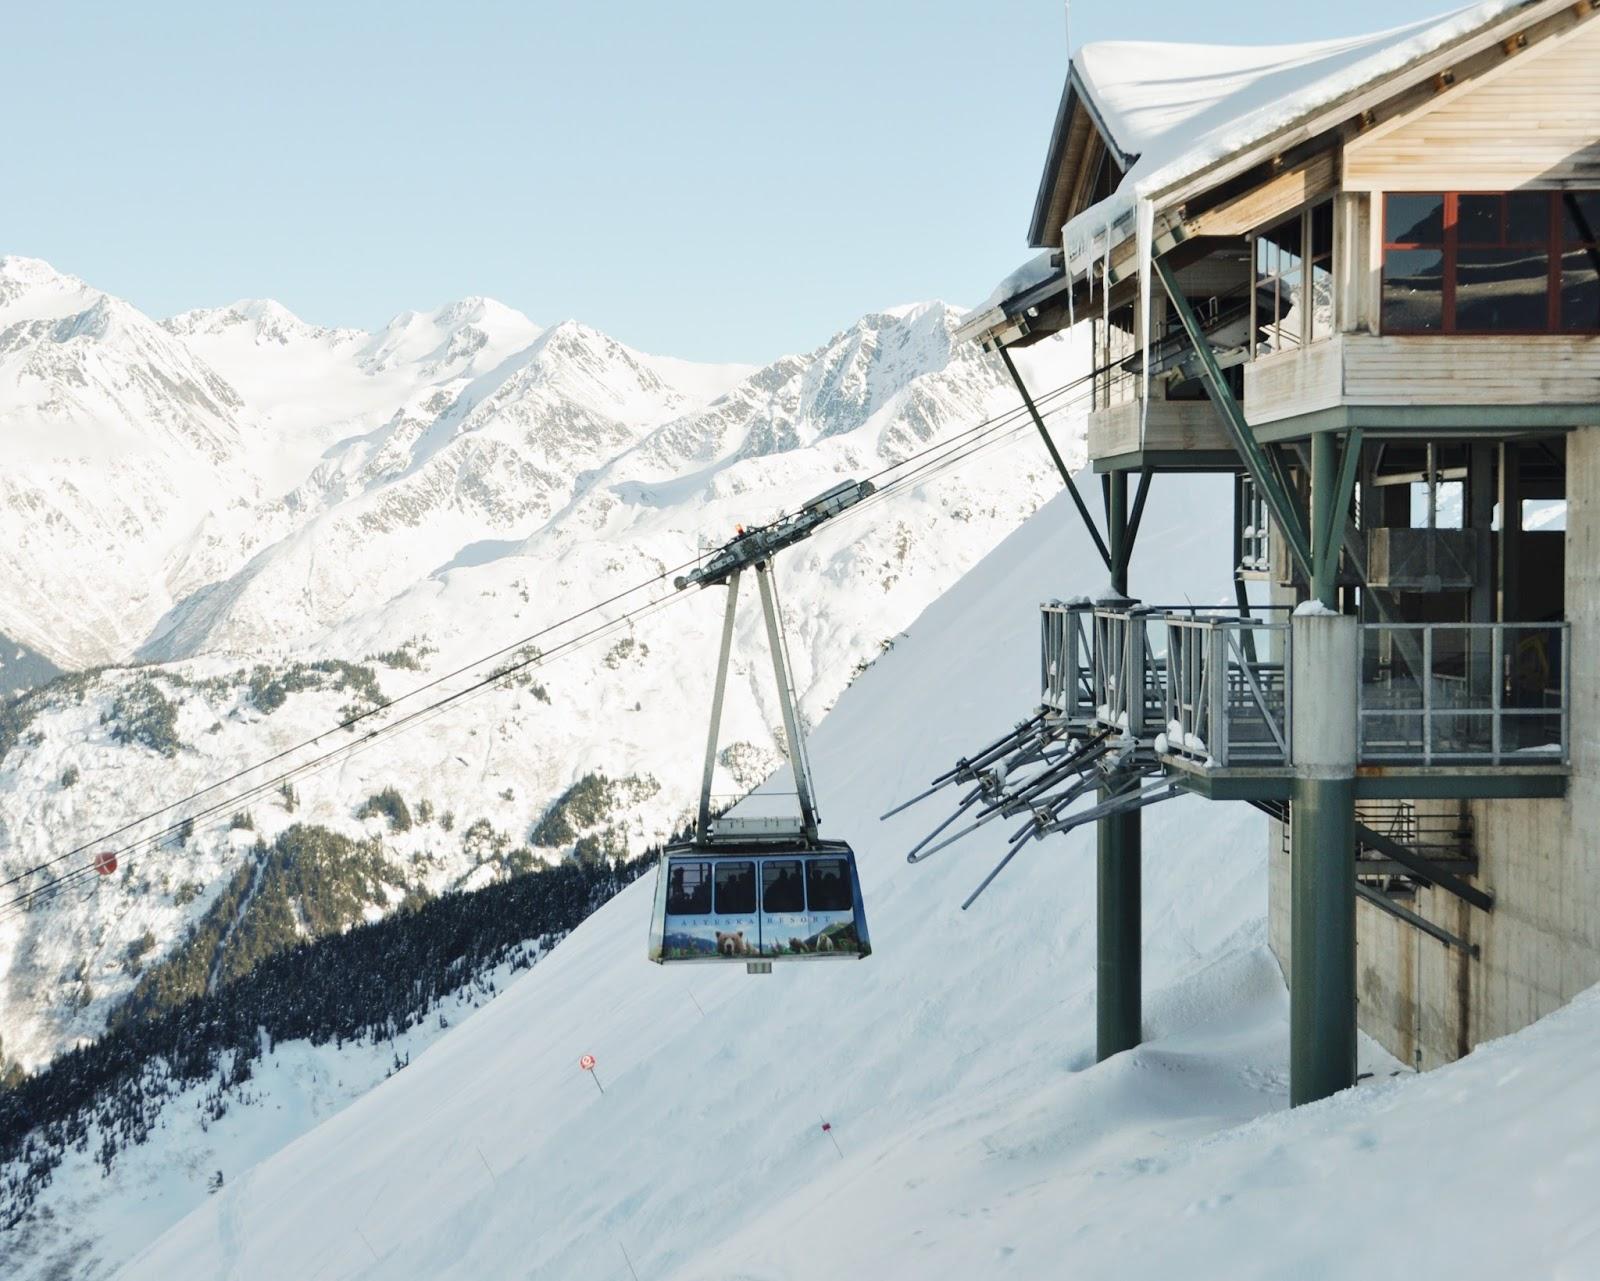 Hotel Alaska tramway